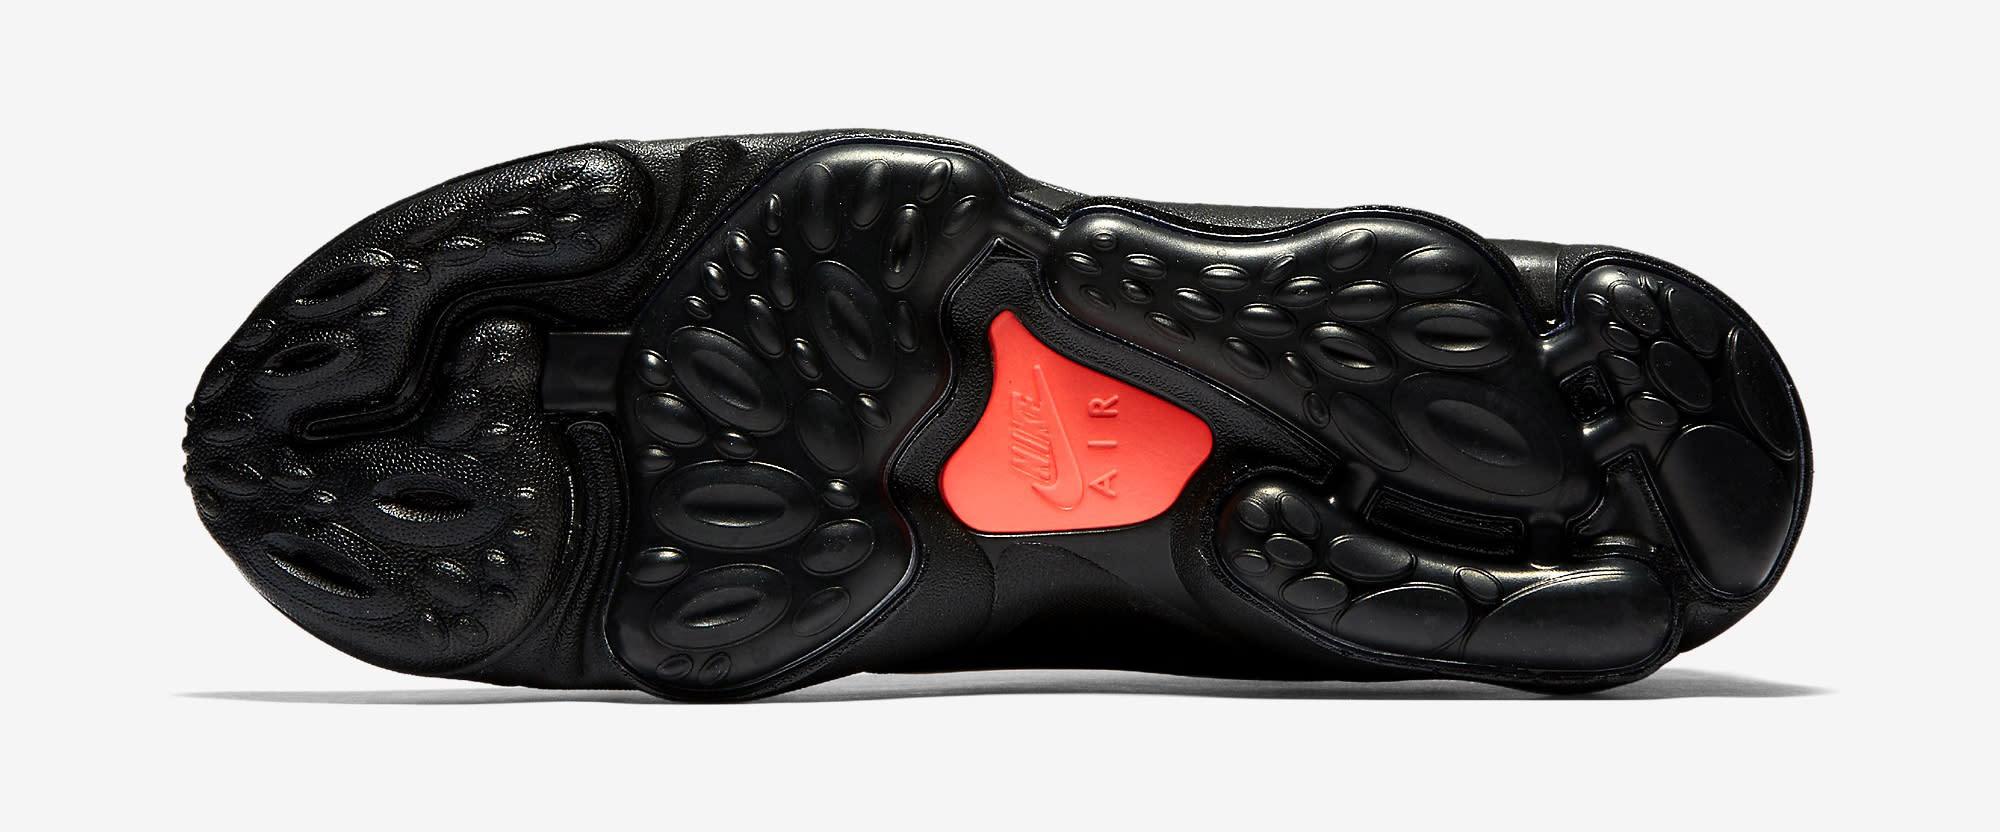 Nike Zoom Spiridon Ultra Black 876267-002 Sole